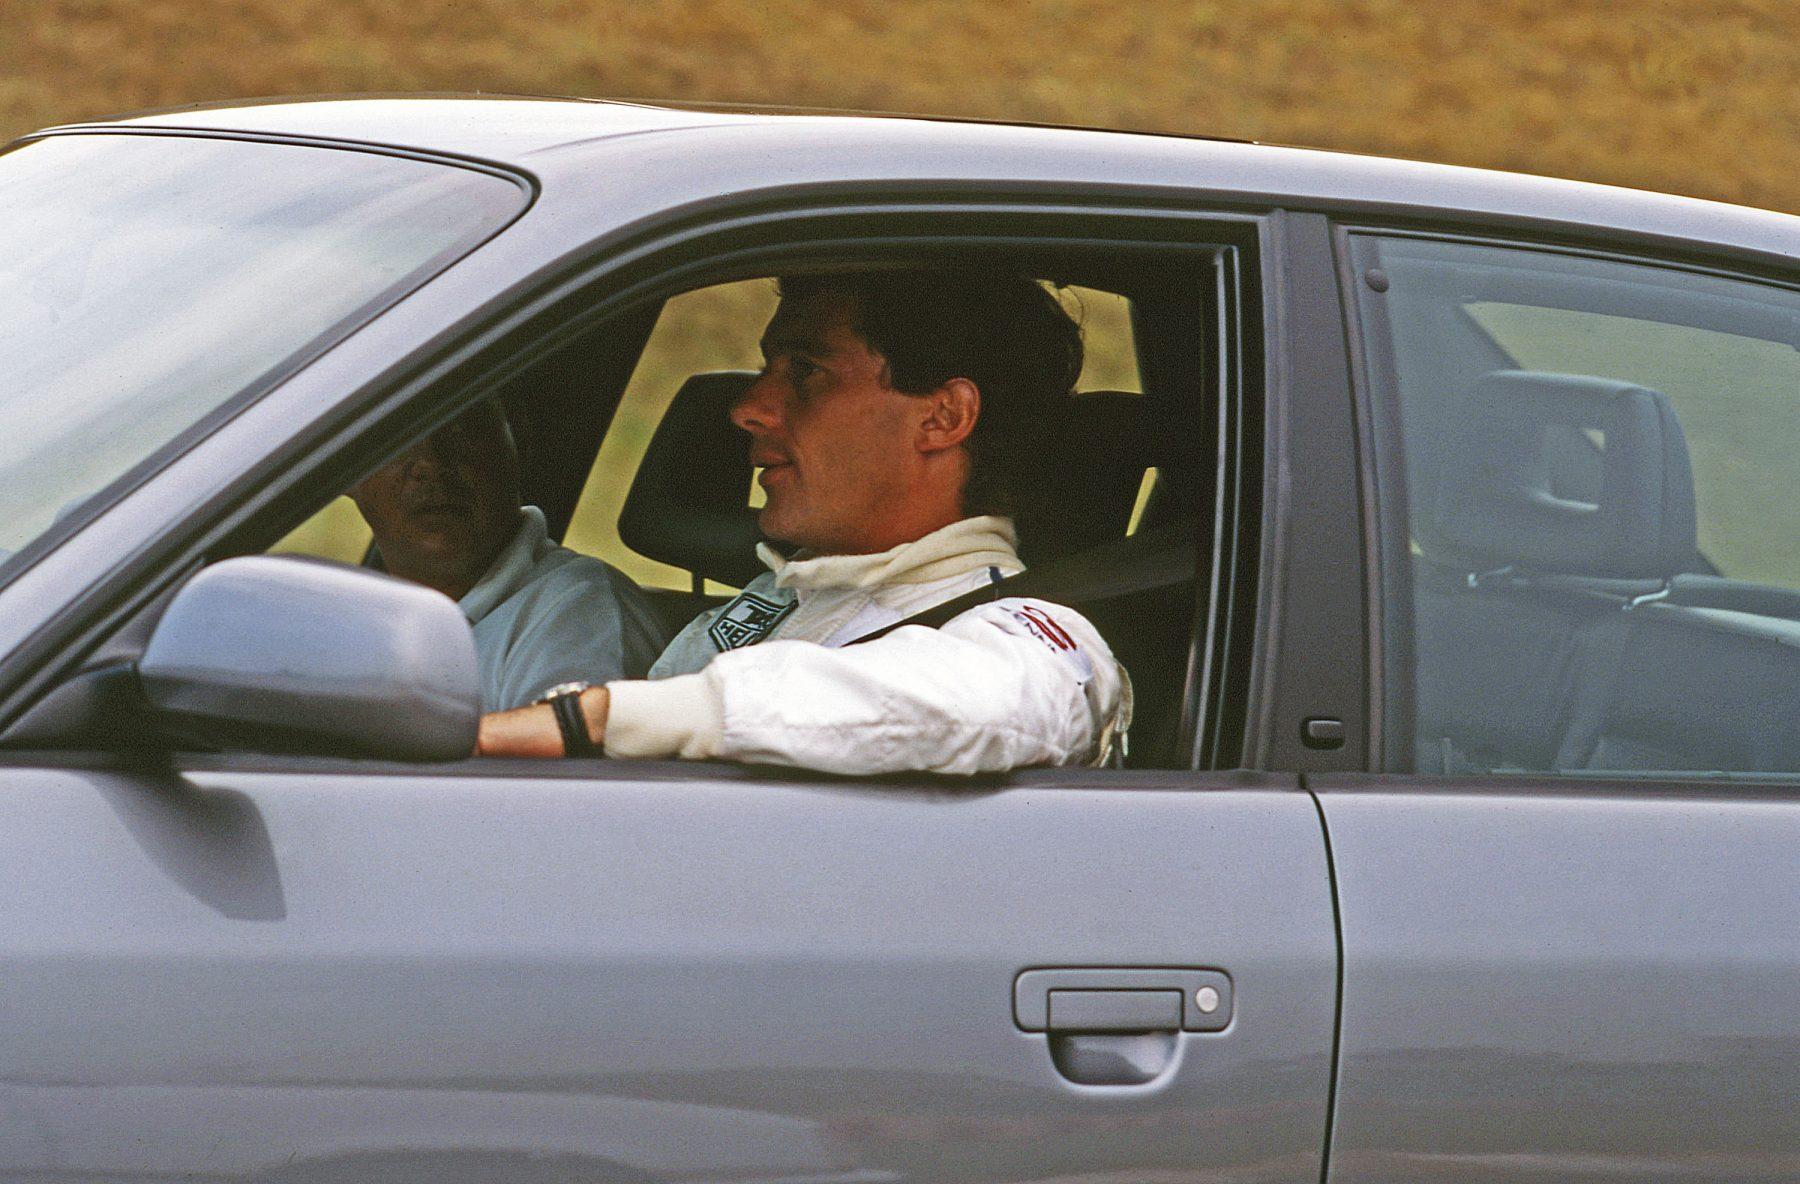 Audi S4 Ayrton Senna